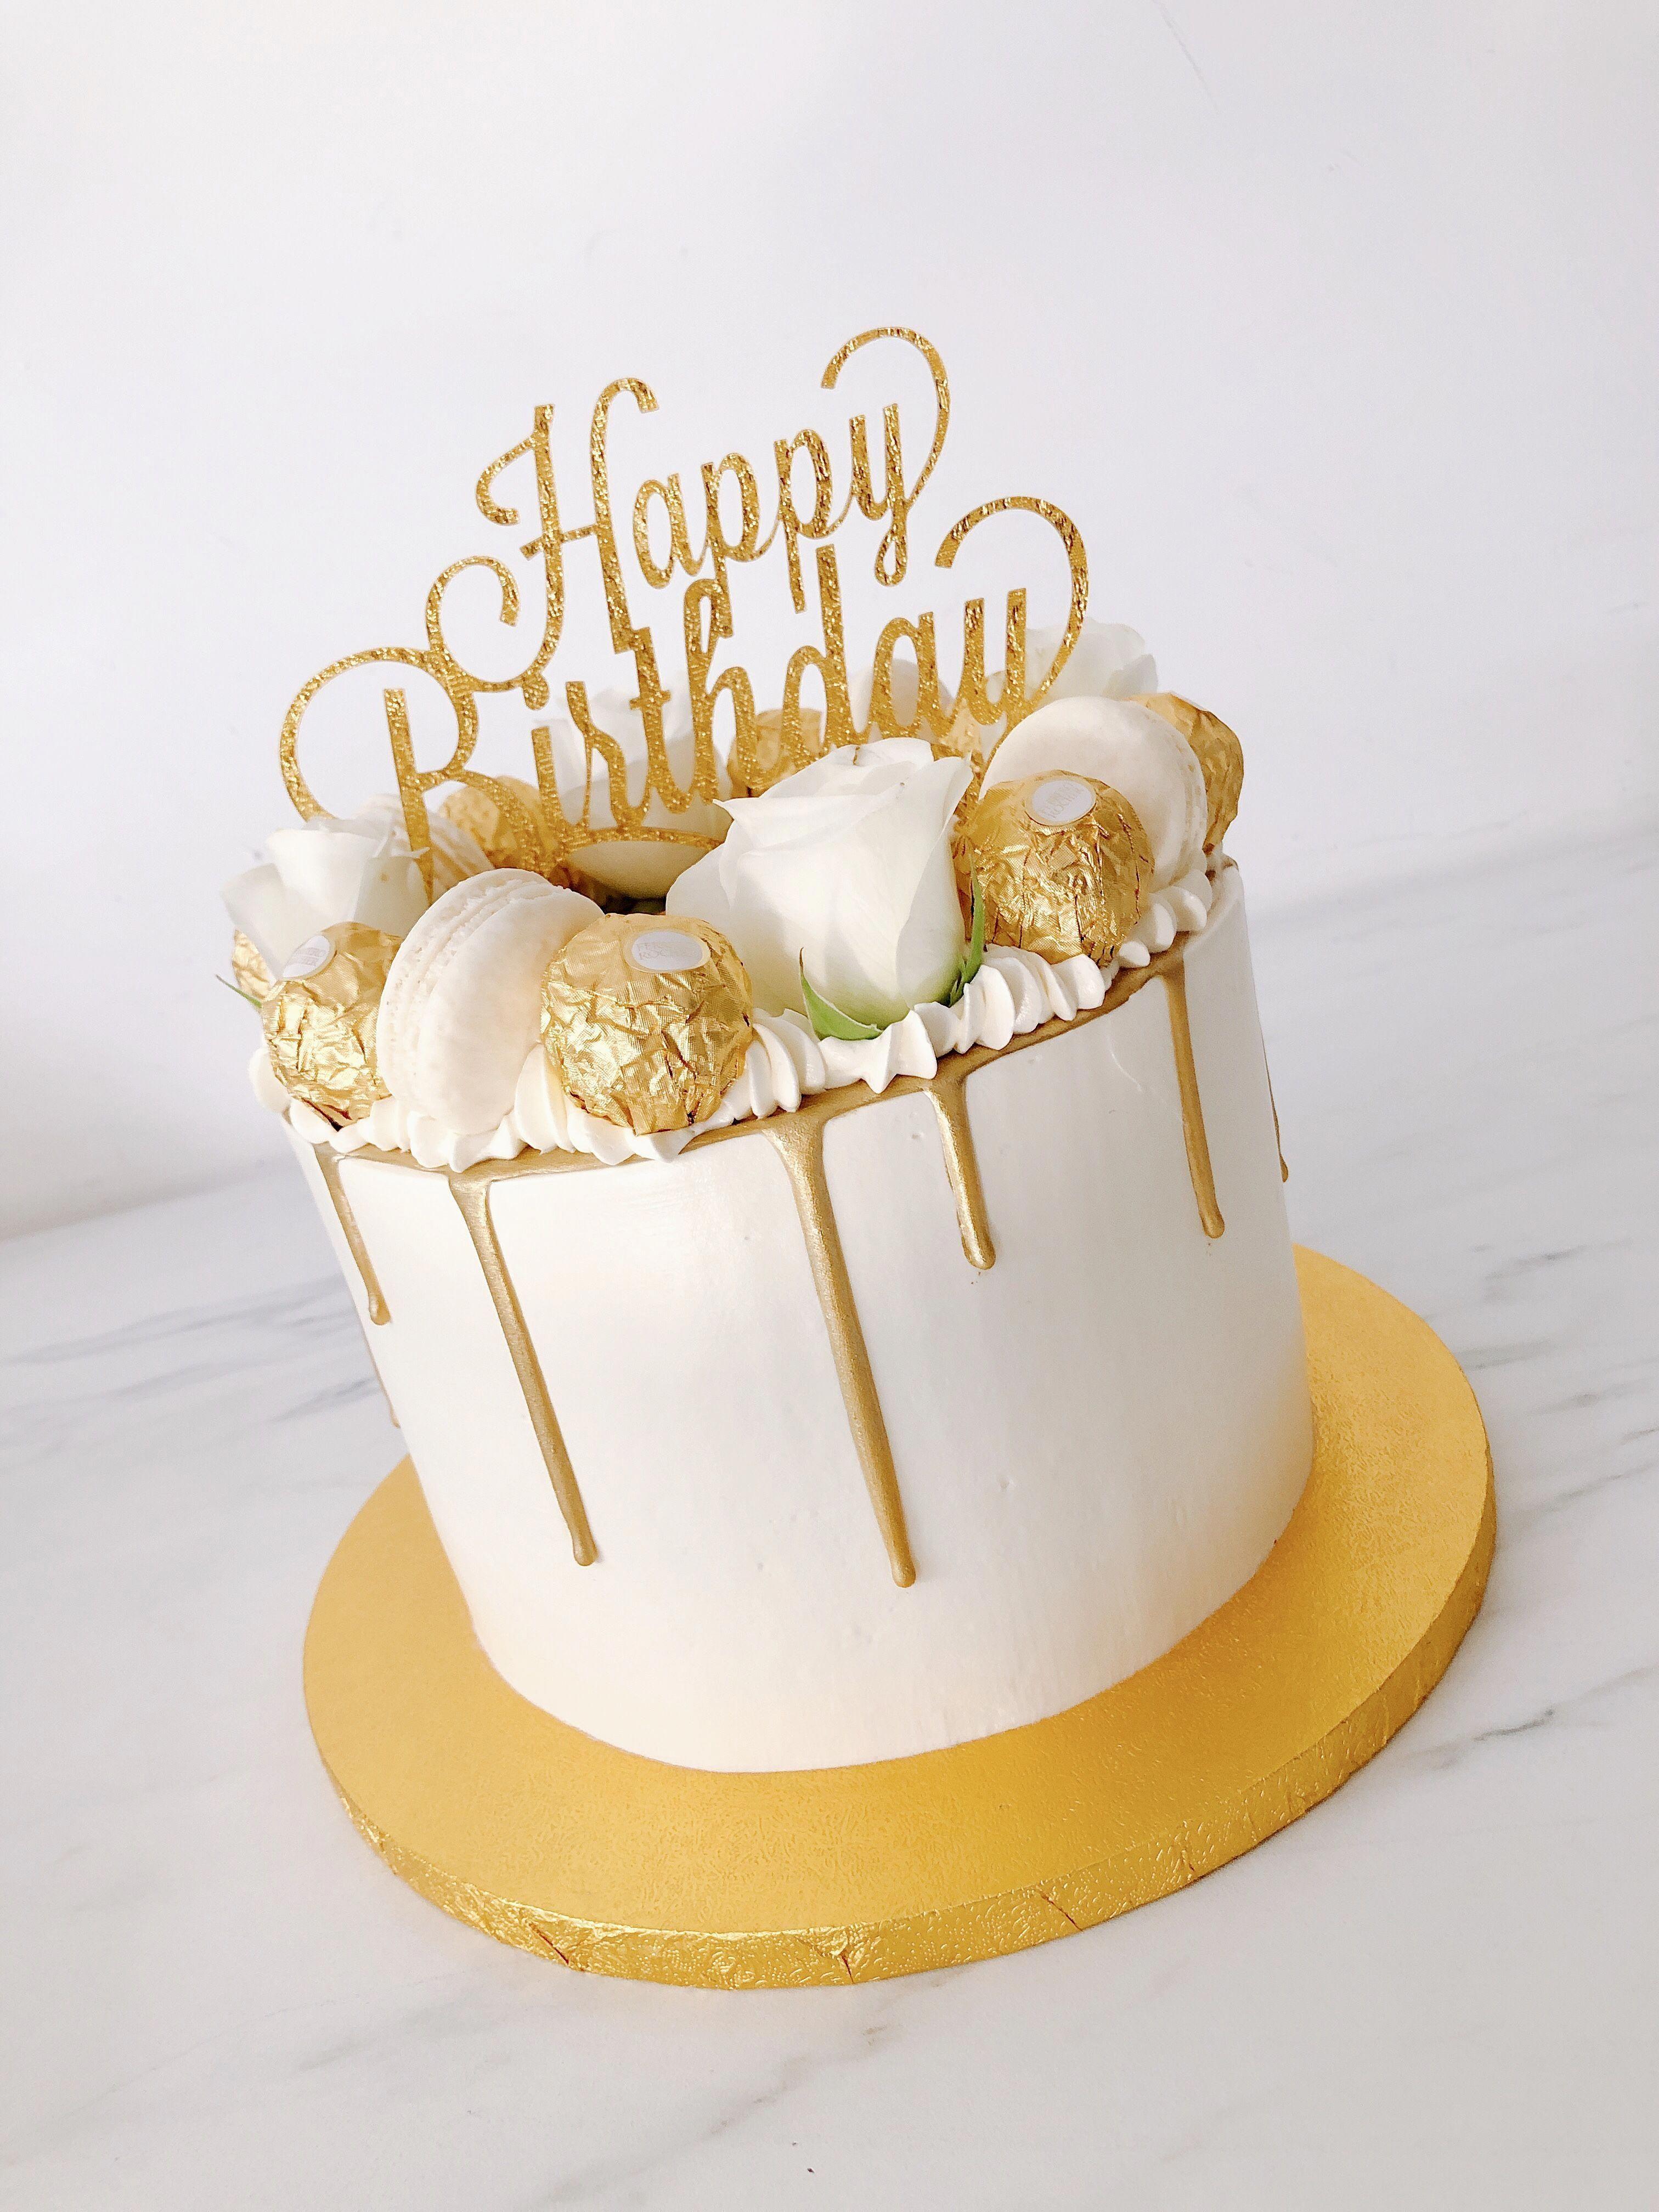 Pin By Amira On Birthday Cake 25th Birthday Cakes Golden Birthday Cakes Simple Birthday Cake